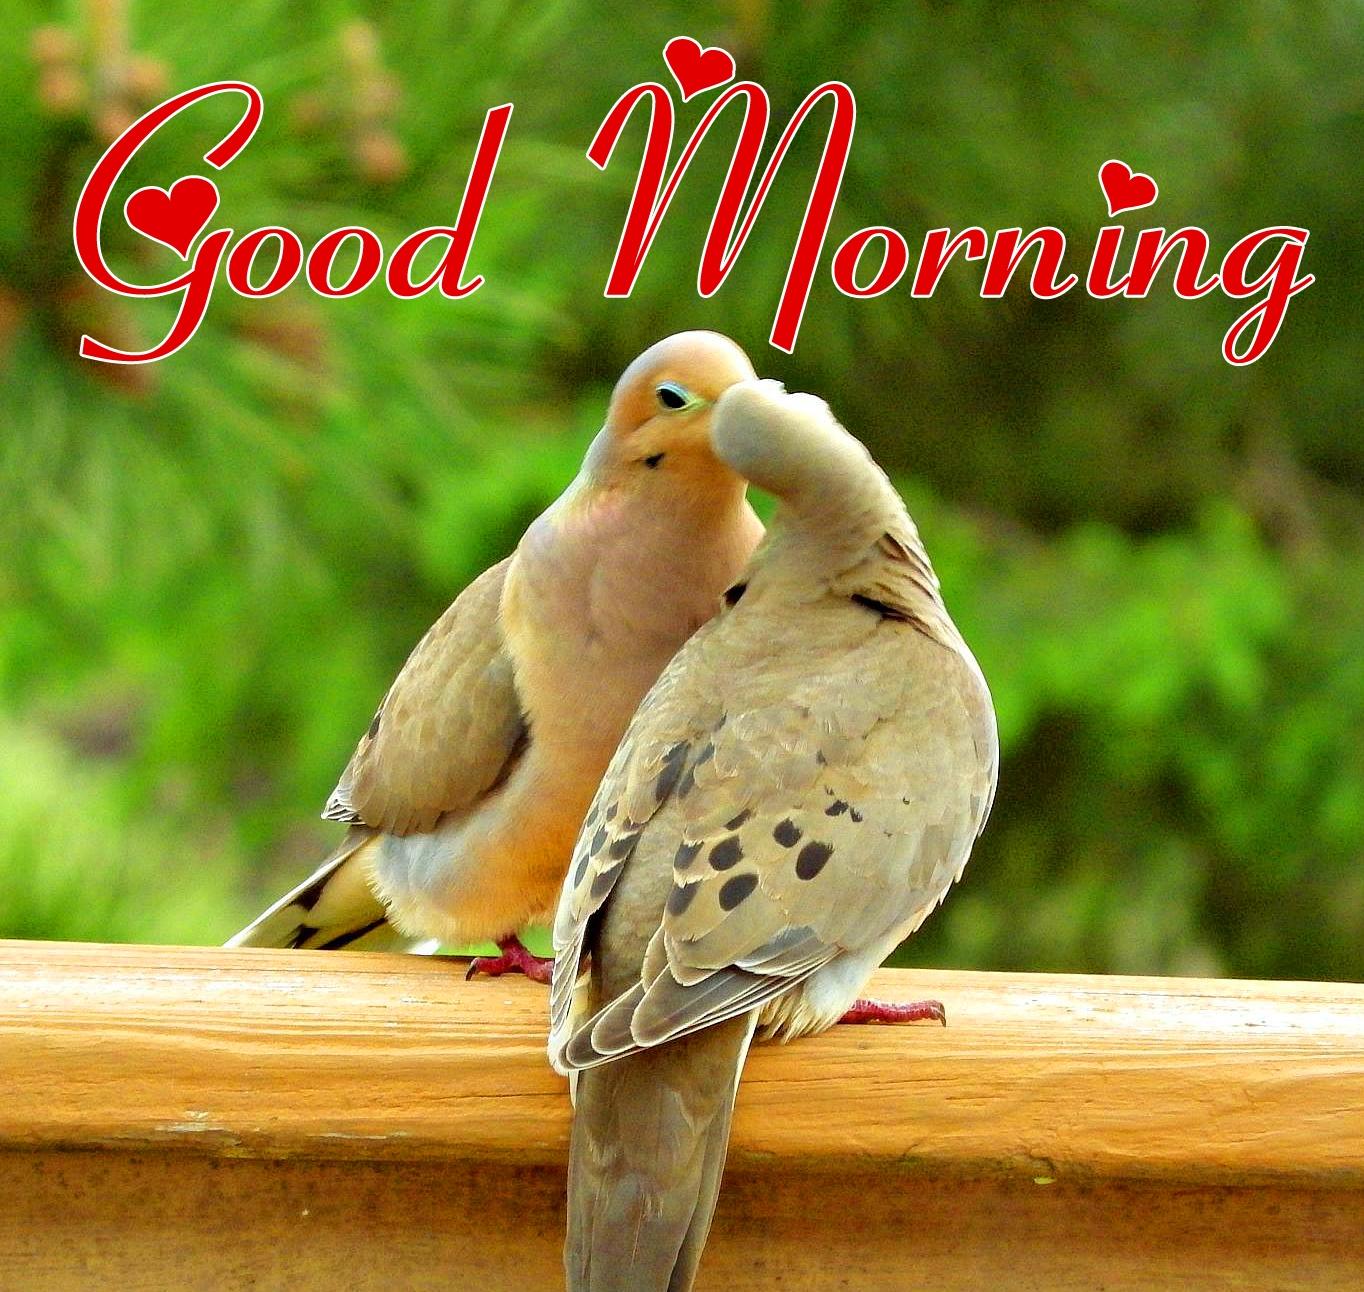 Bird good morning wallpaper Pics Download